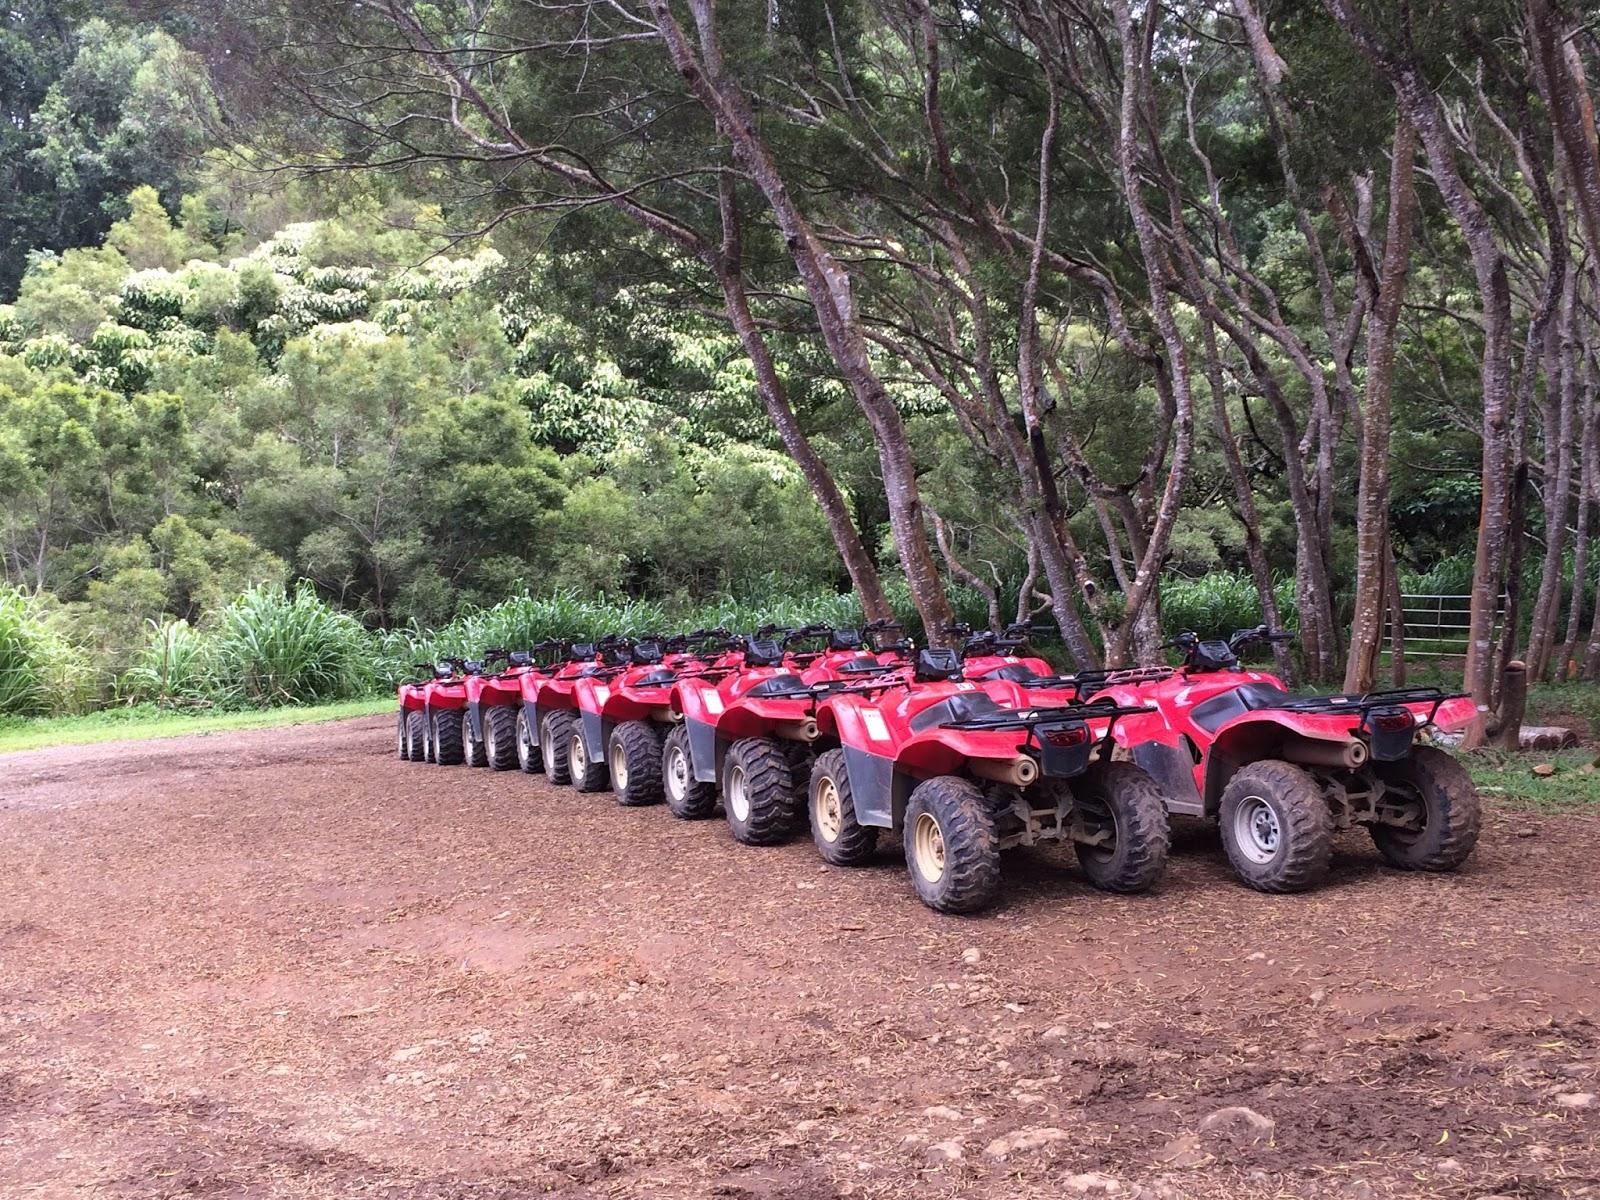 Family Travel Blog : Four wheeling adventure atop Waipio Valley, Big